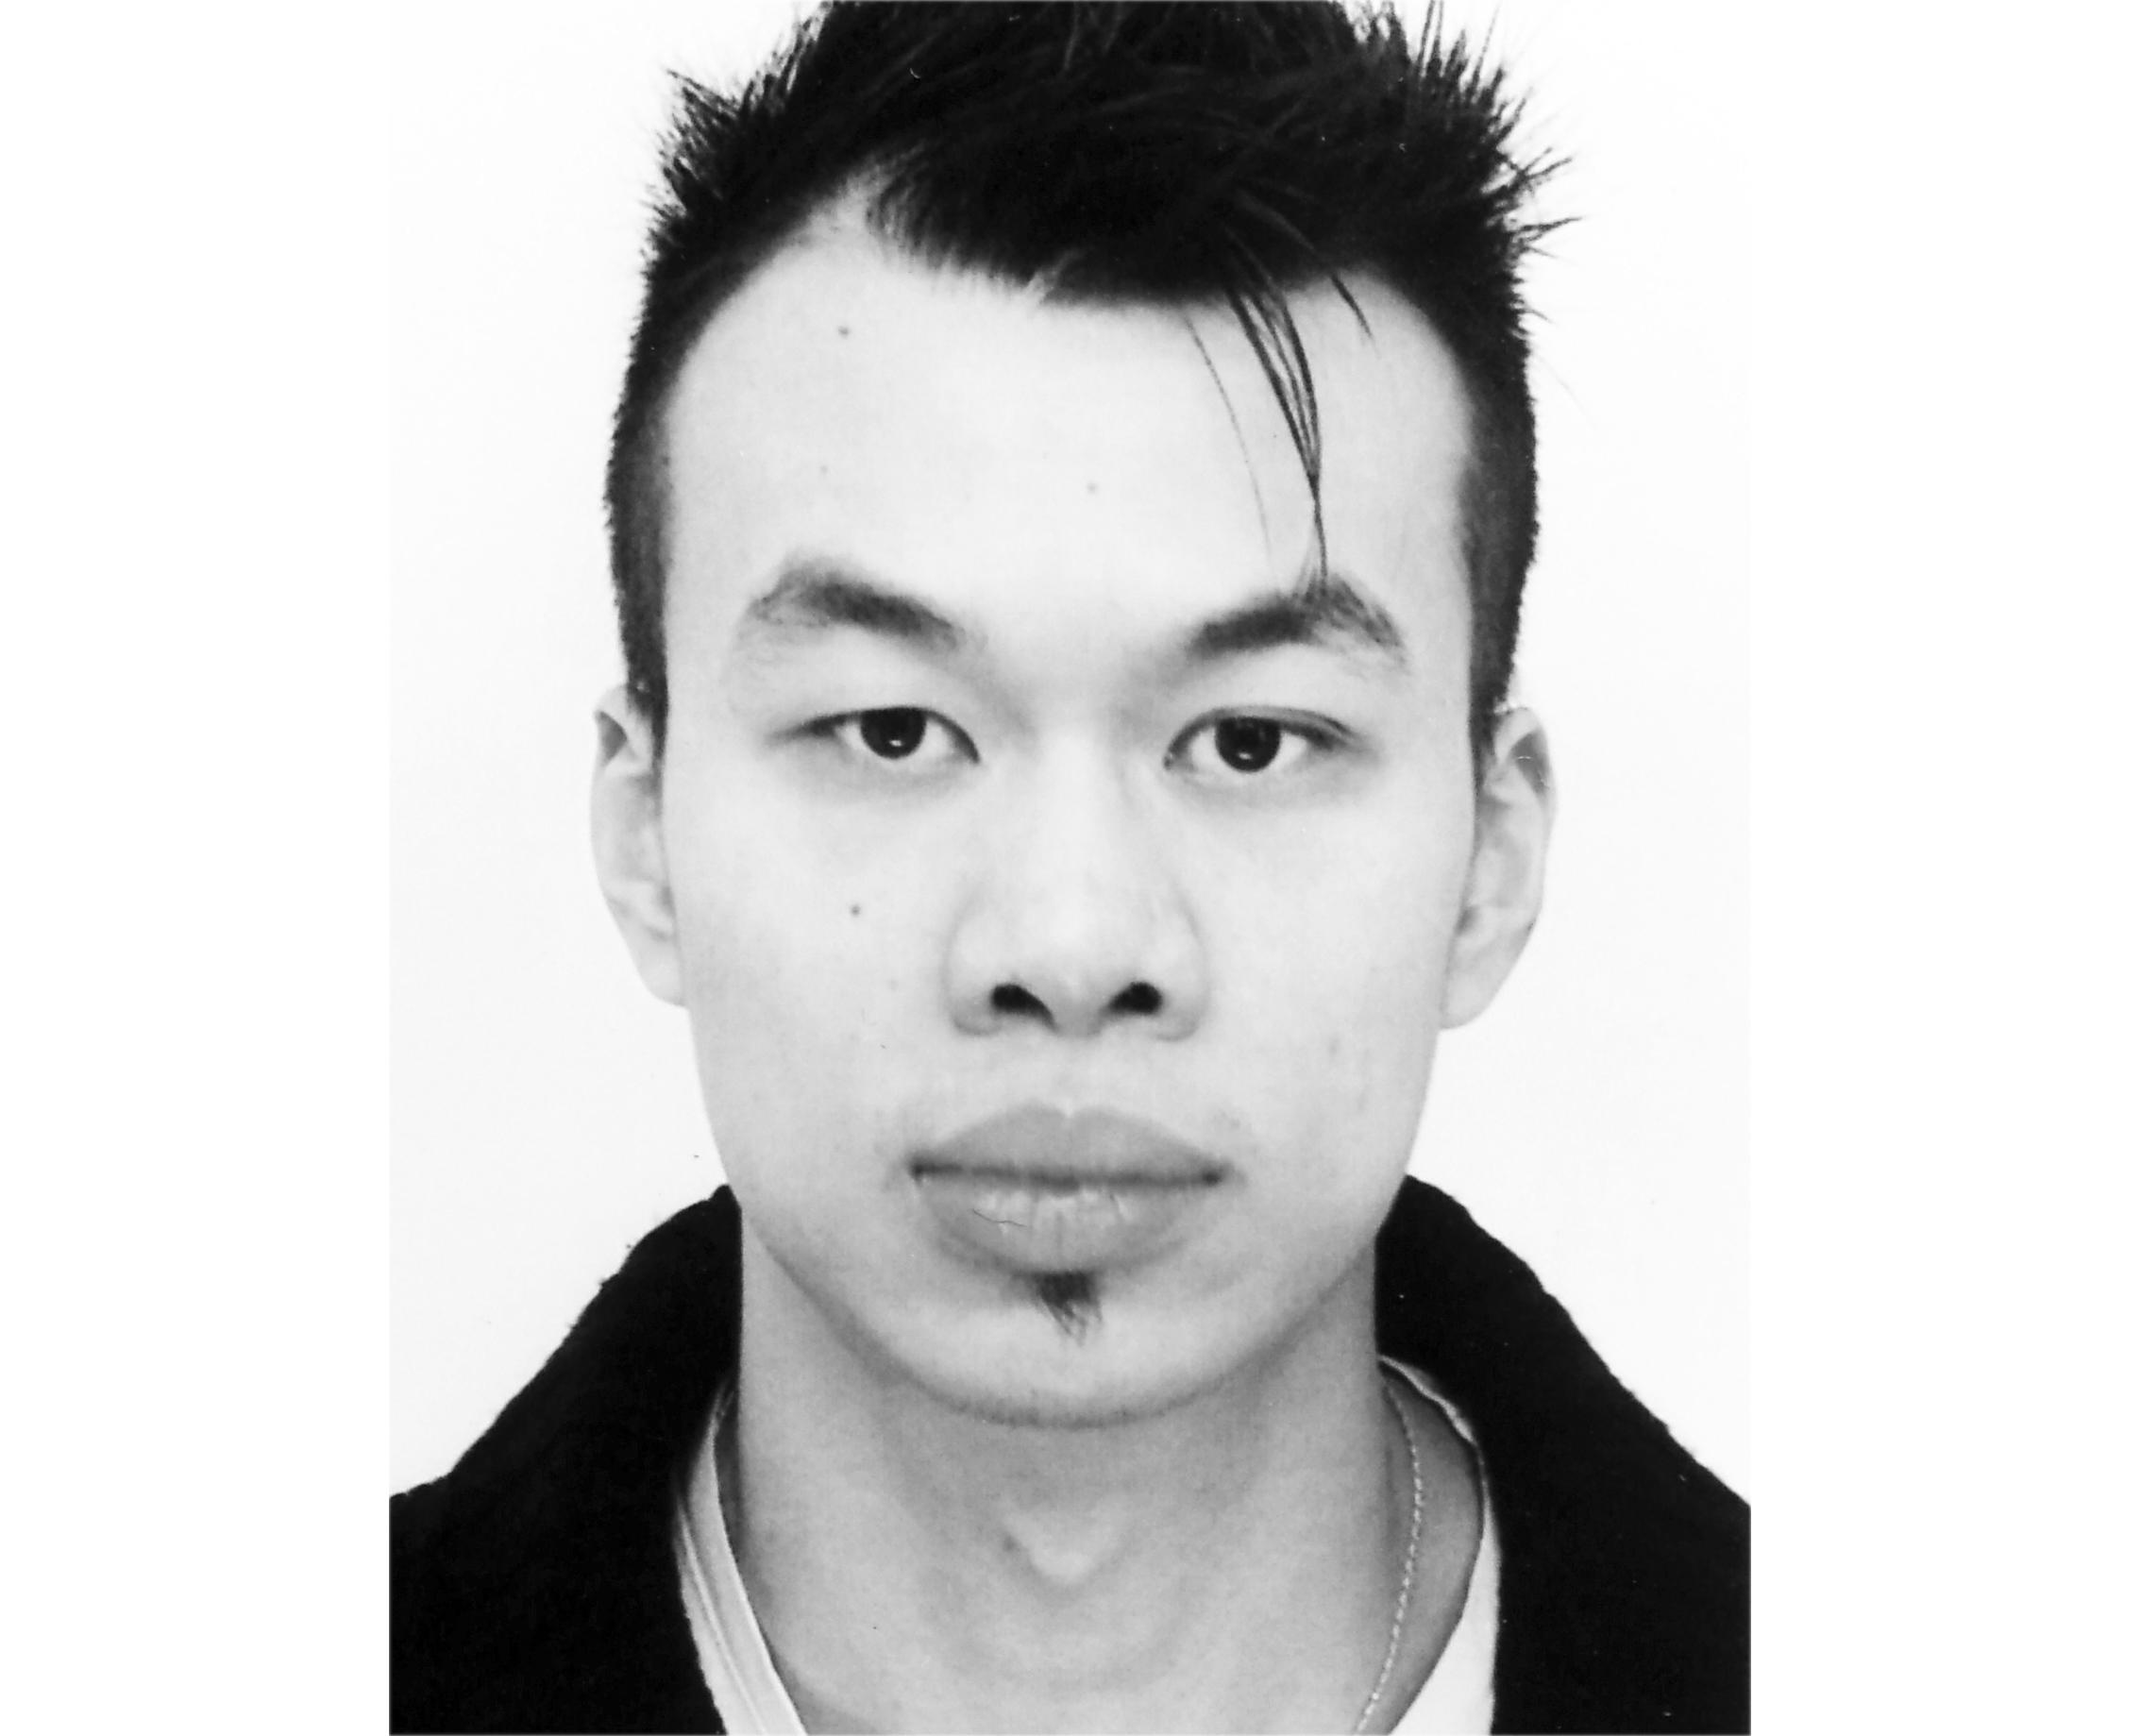 Zhicheng Weng - Mention spéciale